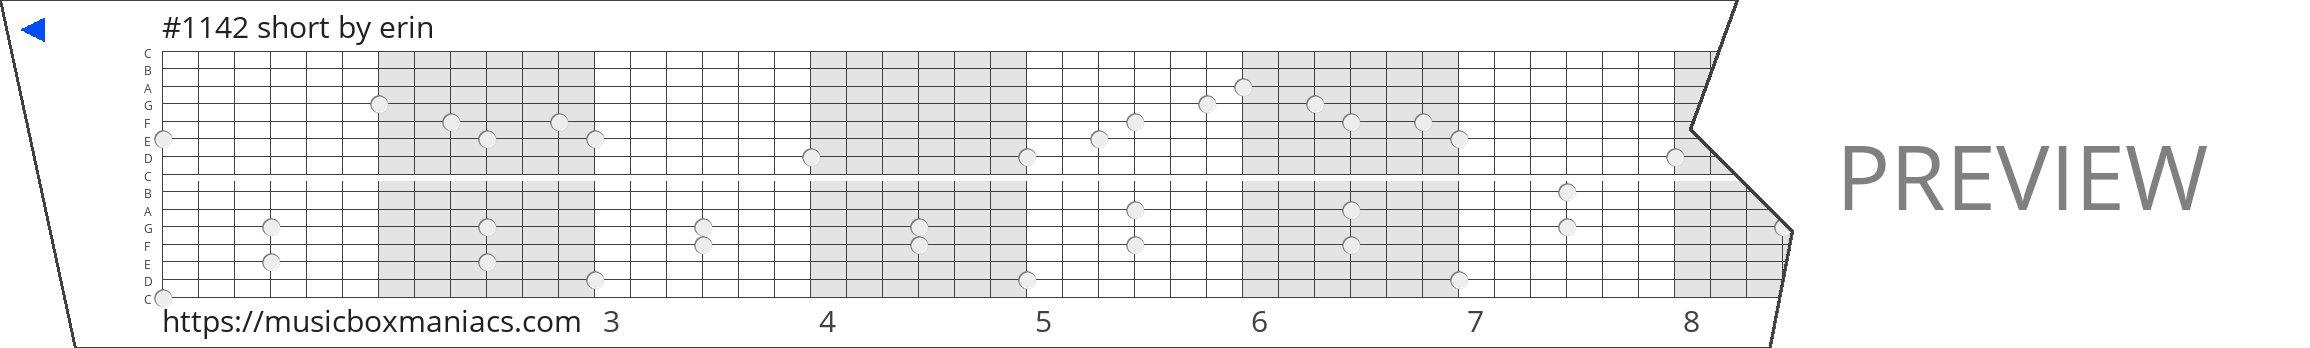 #1142 short 15 note music box paper strip